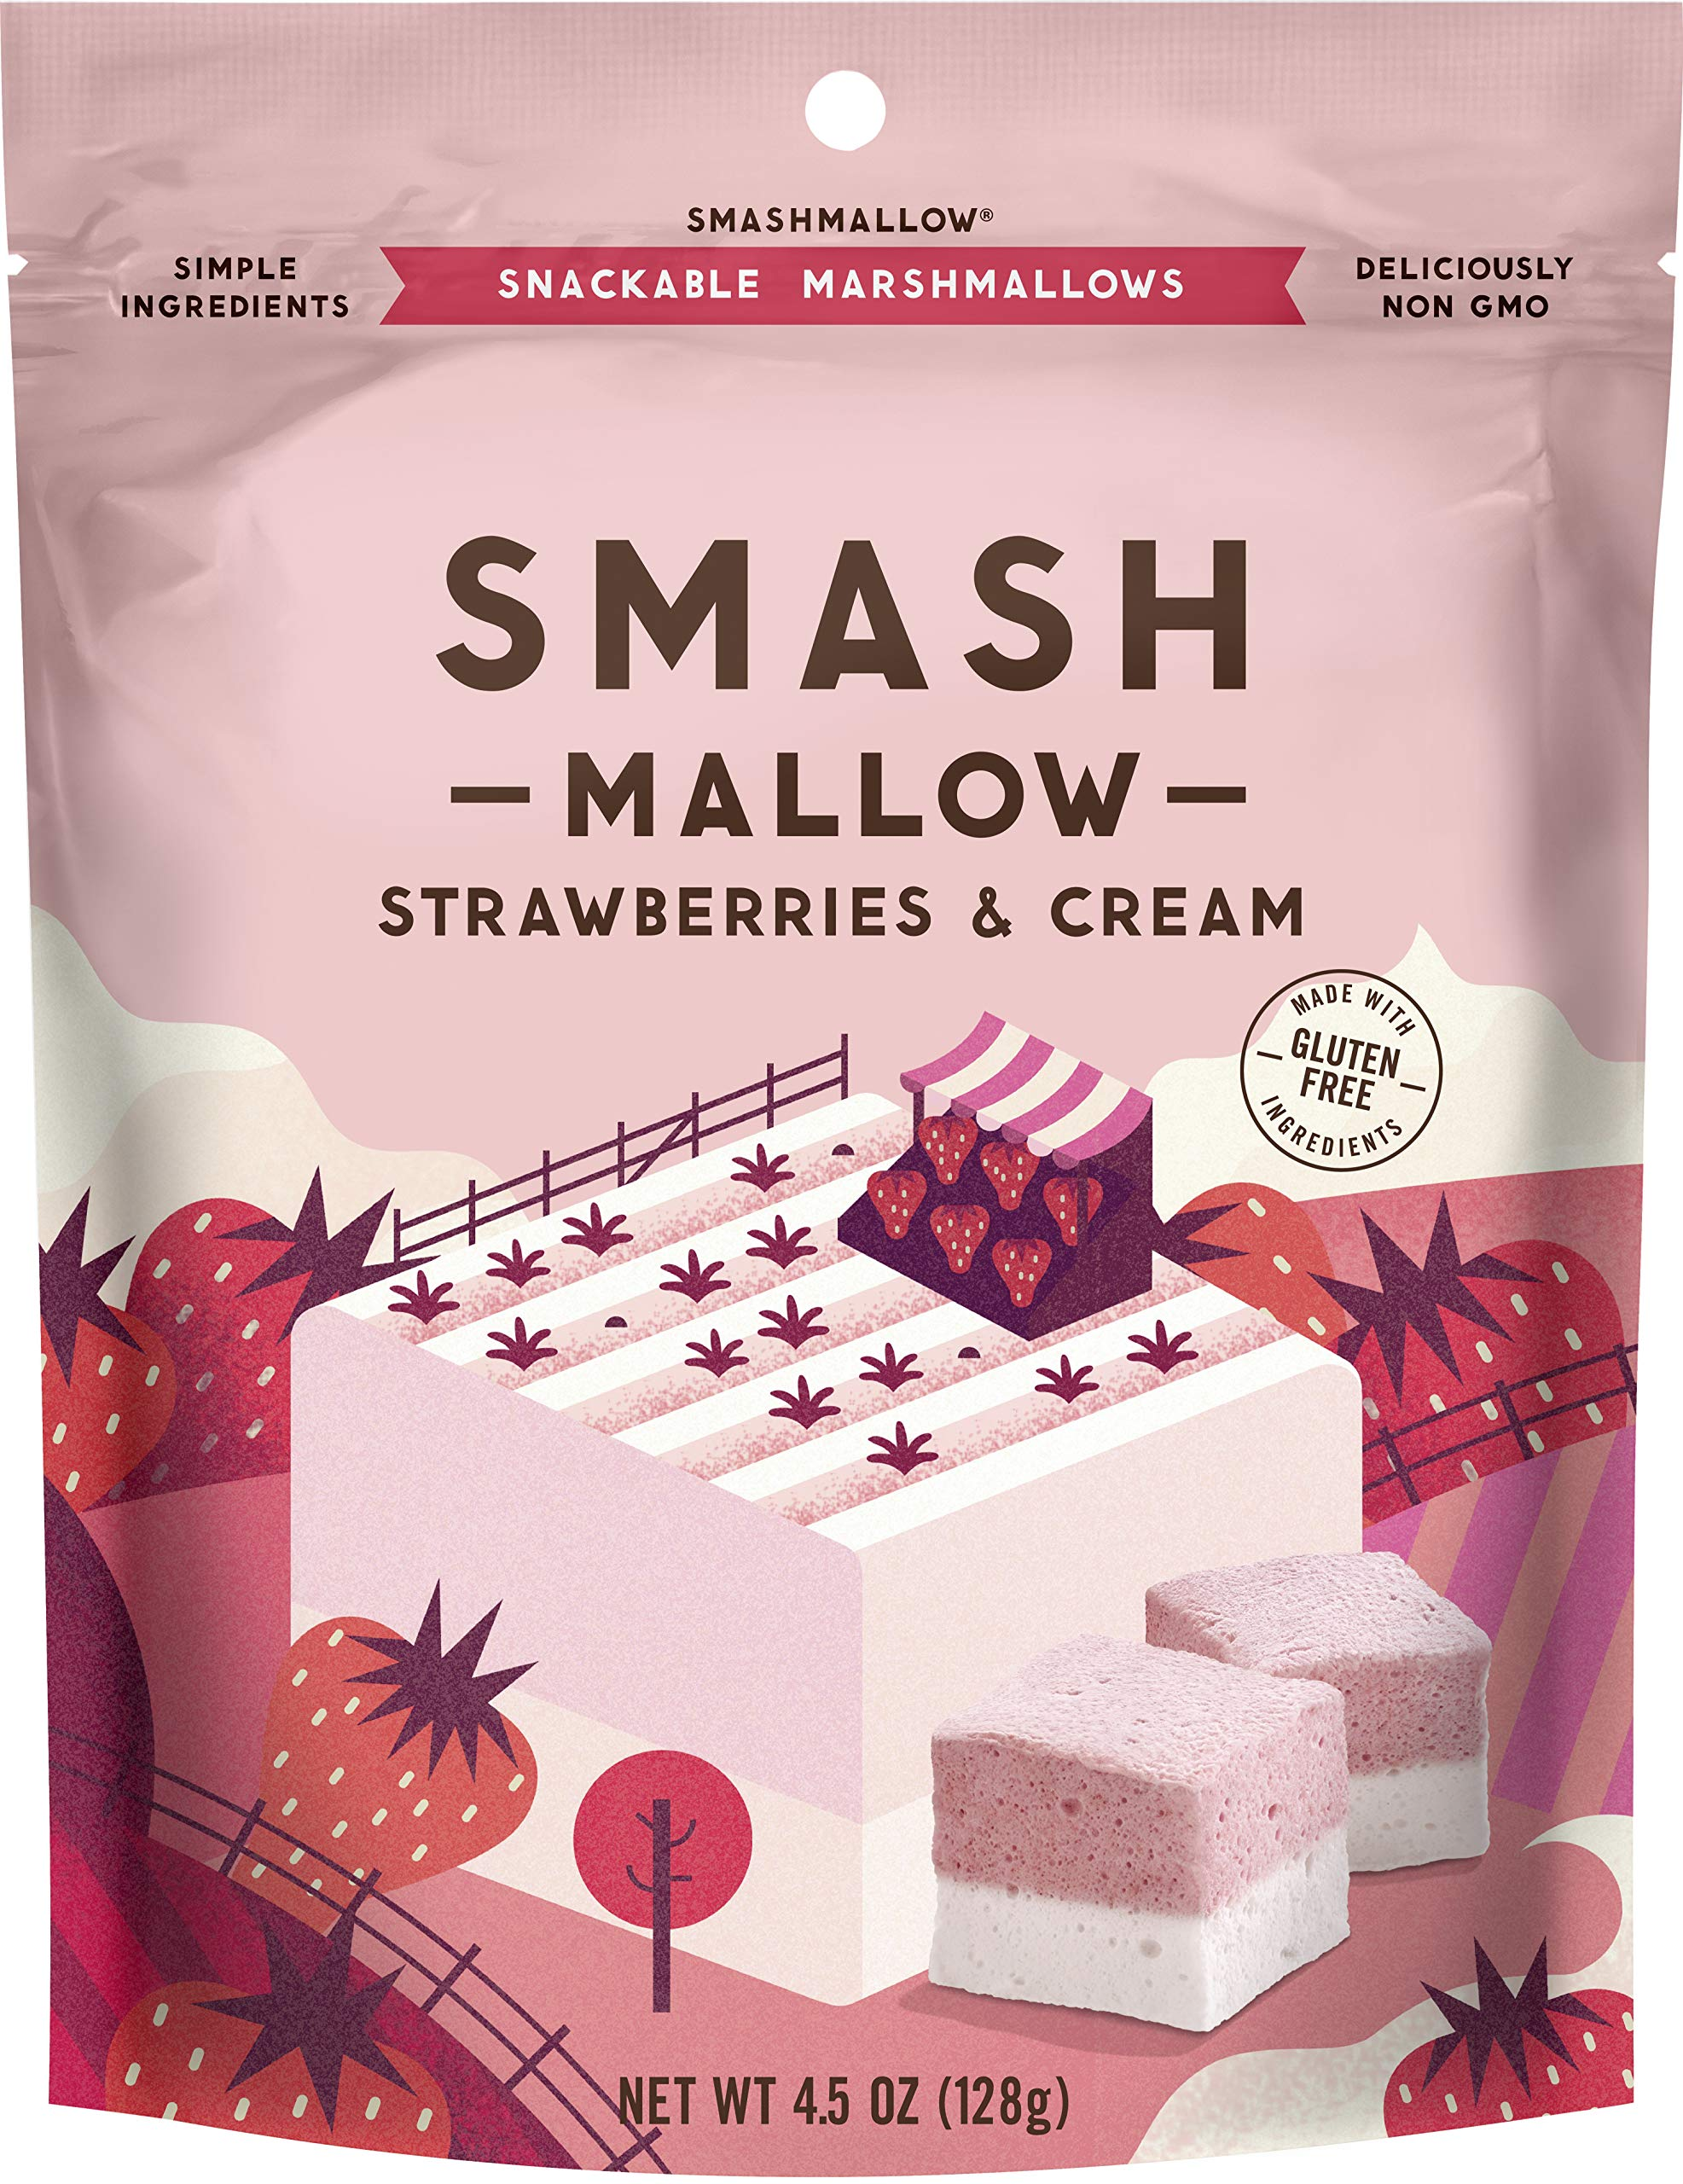 Strawberries & Cream by SMASHMALLOW | Snackable Marshmallows | Non-GMO | Organic Cane Sugar | 80 calories | (4.5 oz) by Smashmallow